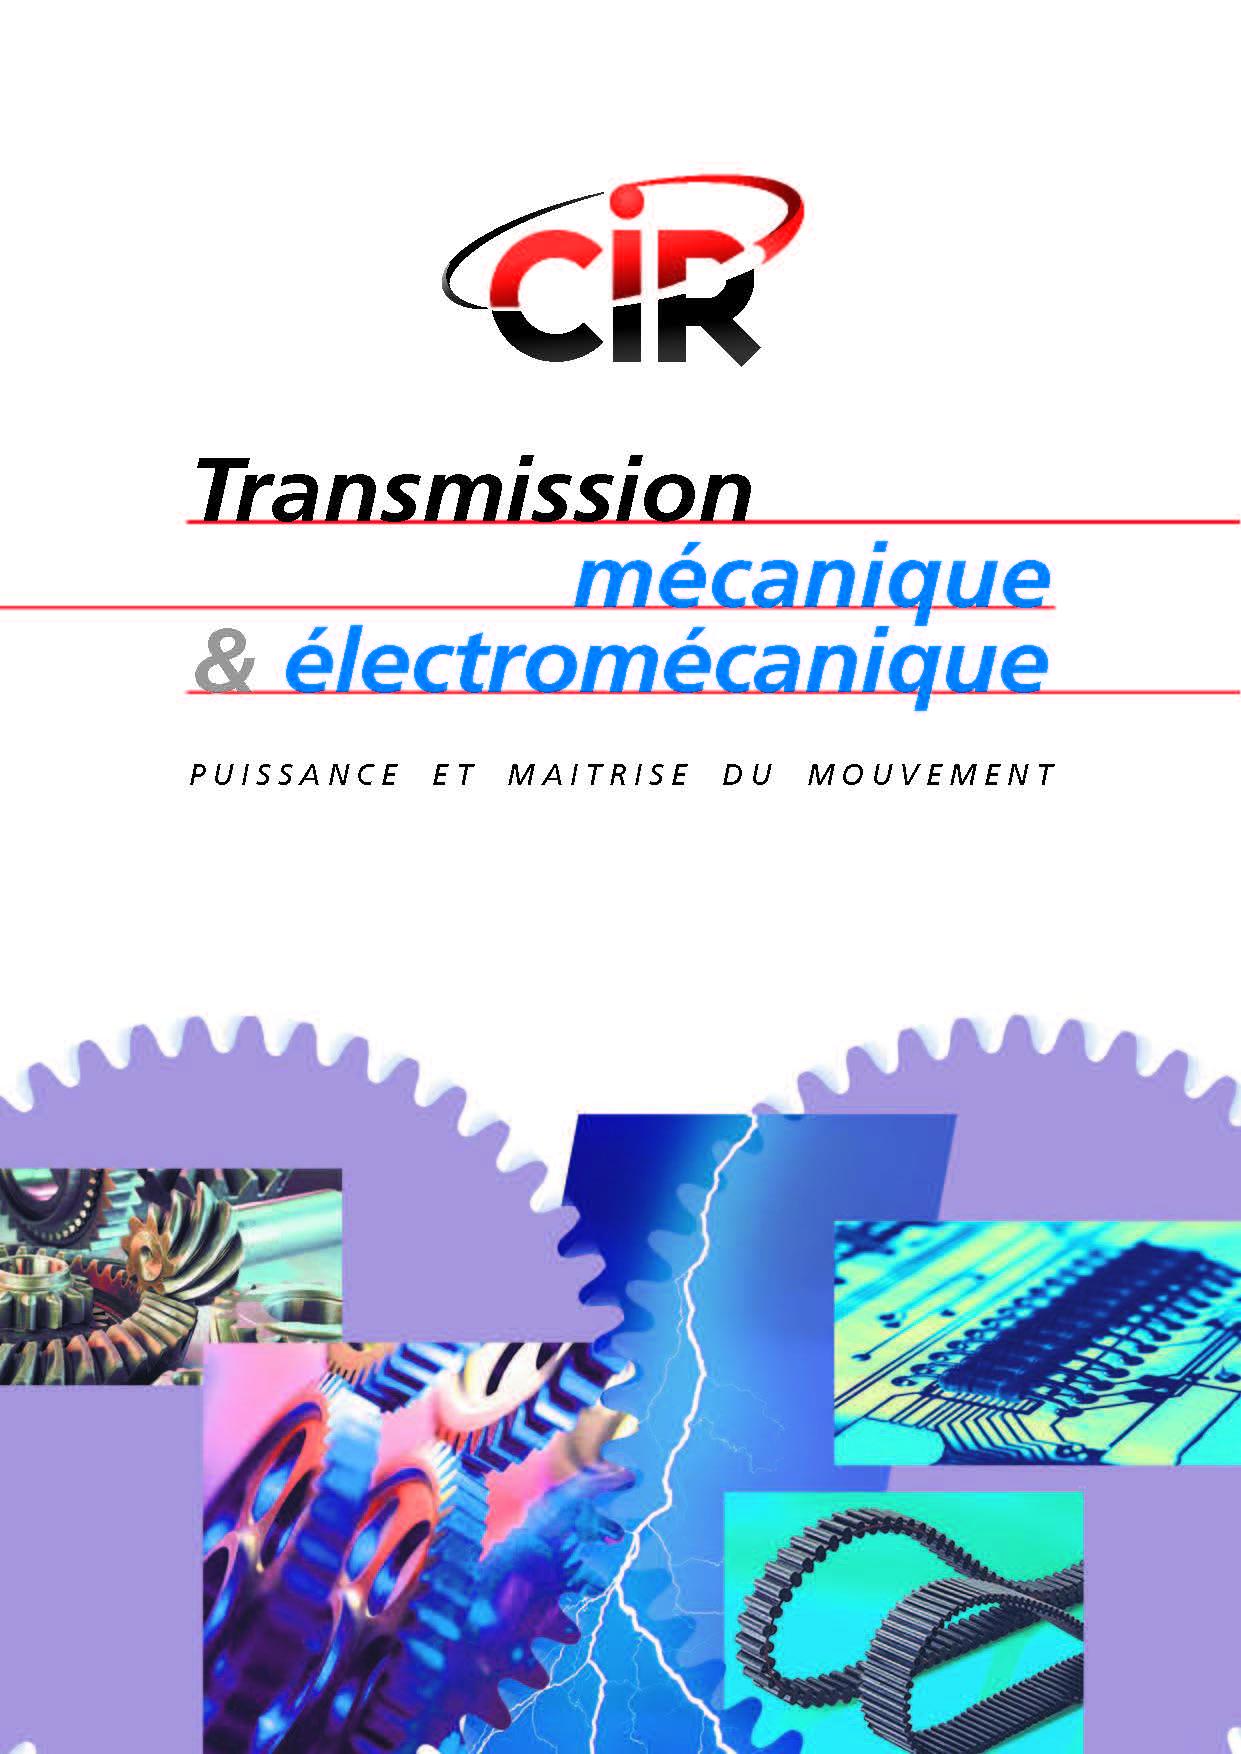 CIR Transmission mécanique